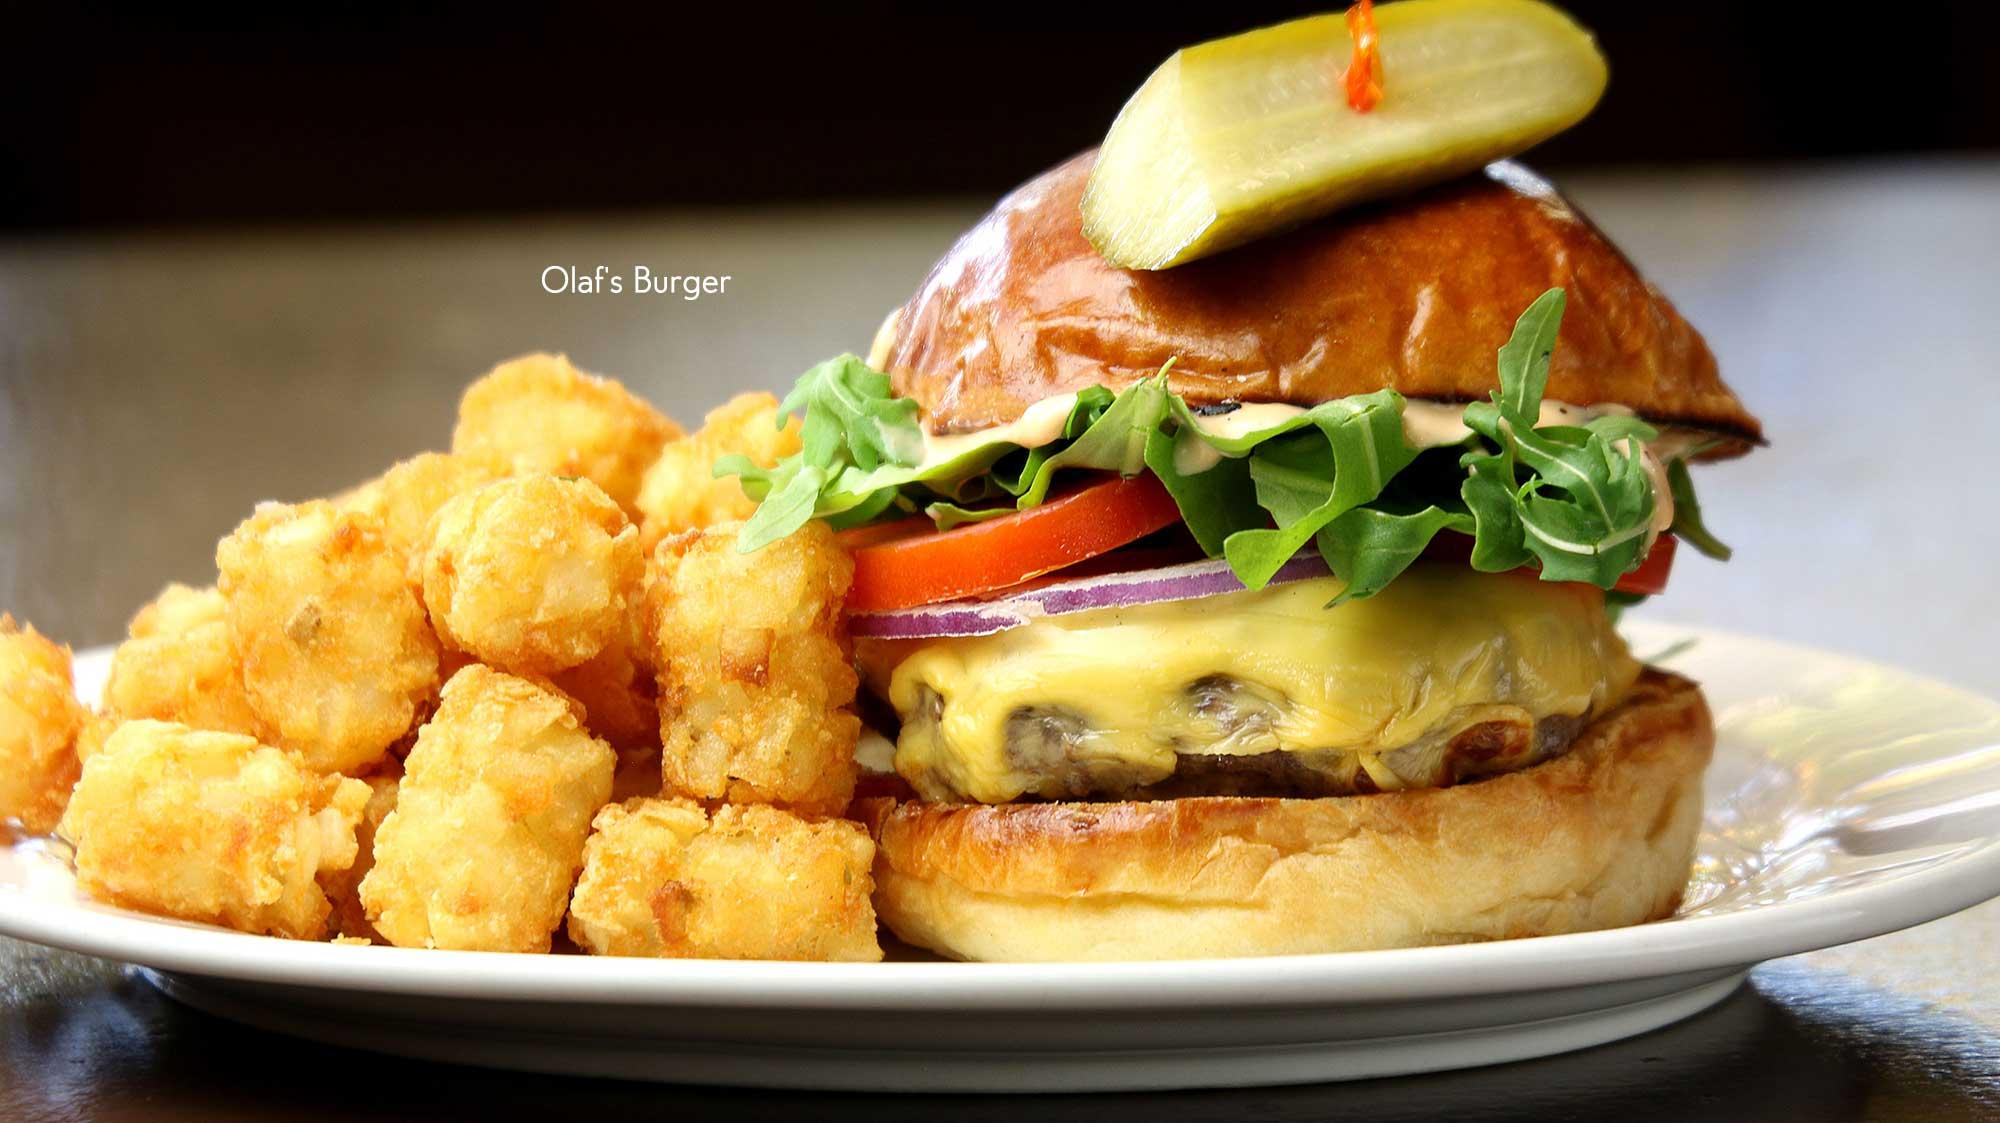 Olaf's-Burger-olafs-ballard.jpg